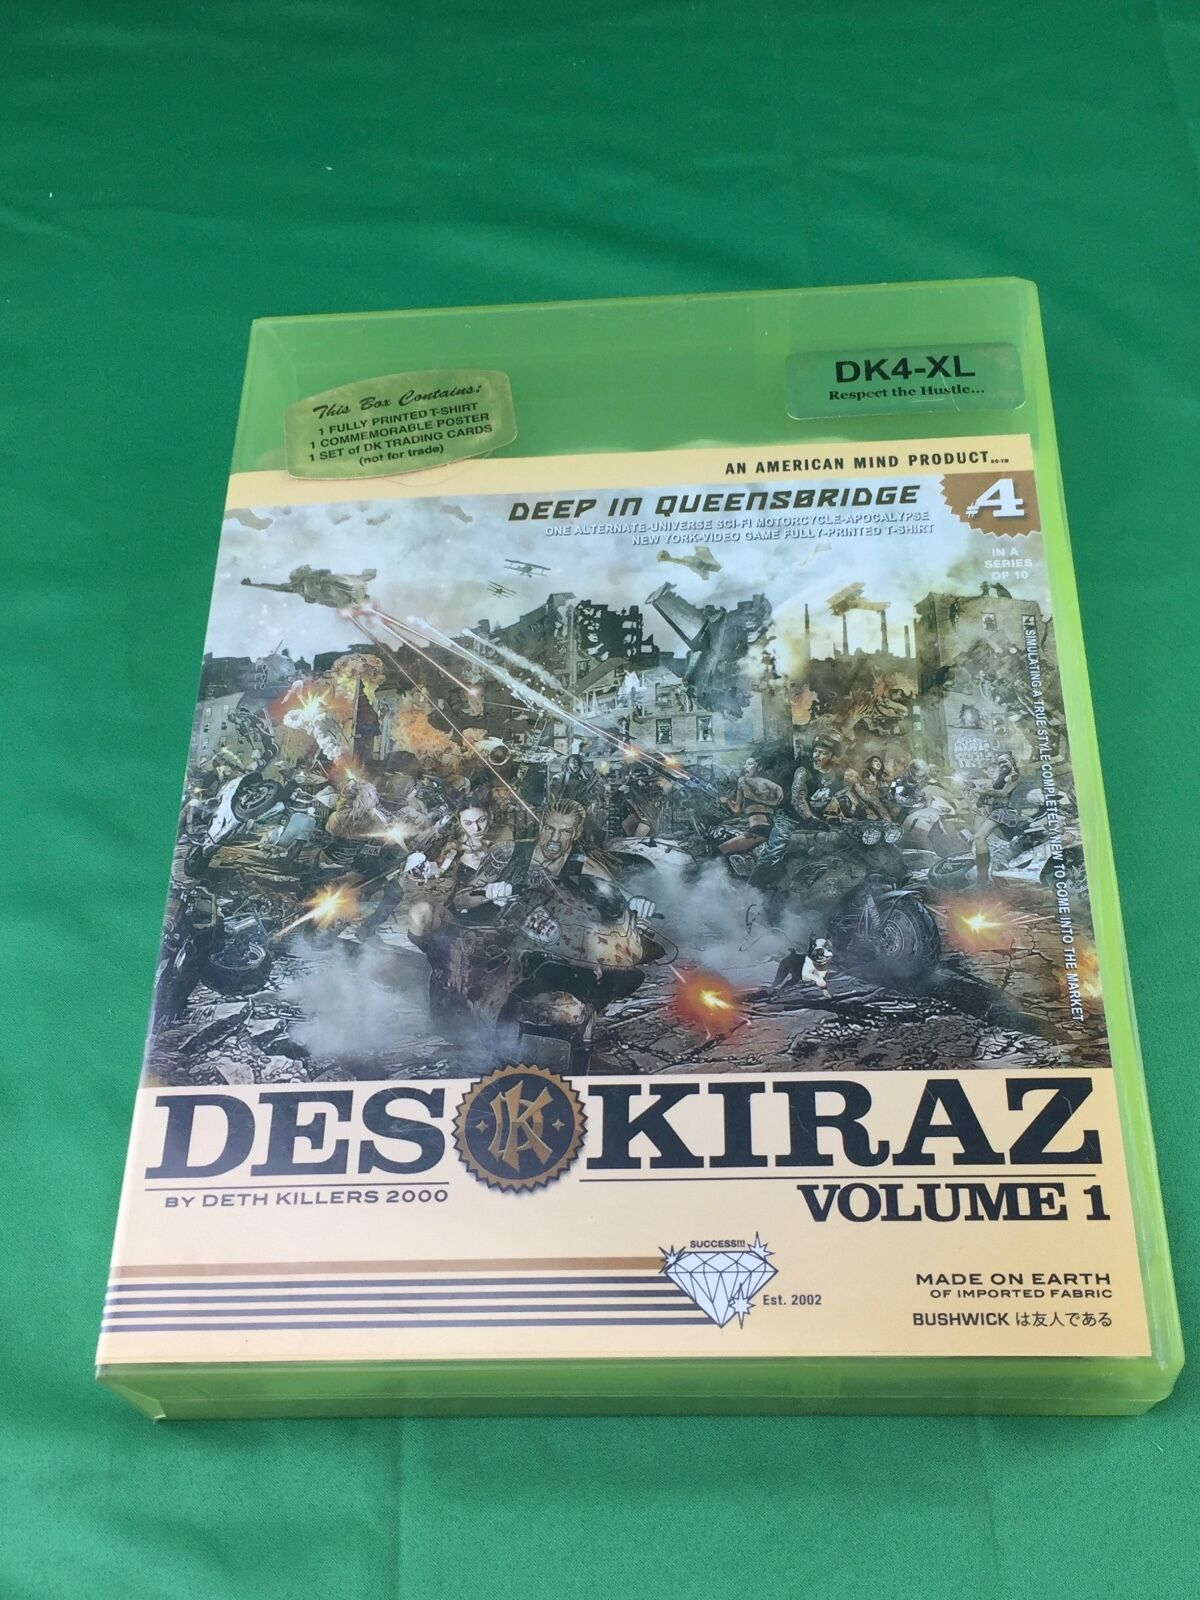 Deth Killers 2000 Volume 1  4 T-shirt XL Des Kiraz Deep In Queensbridge